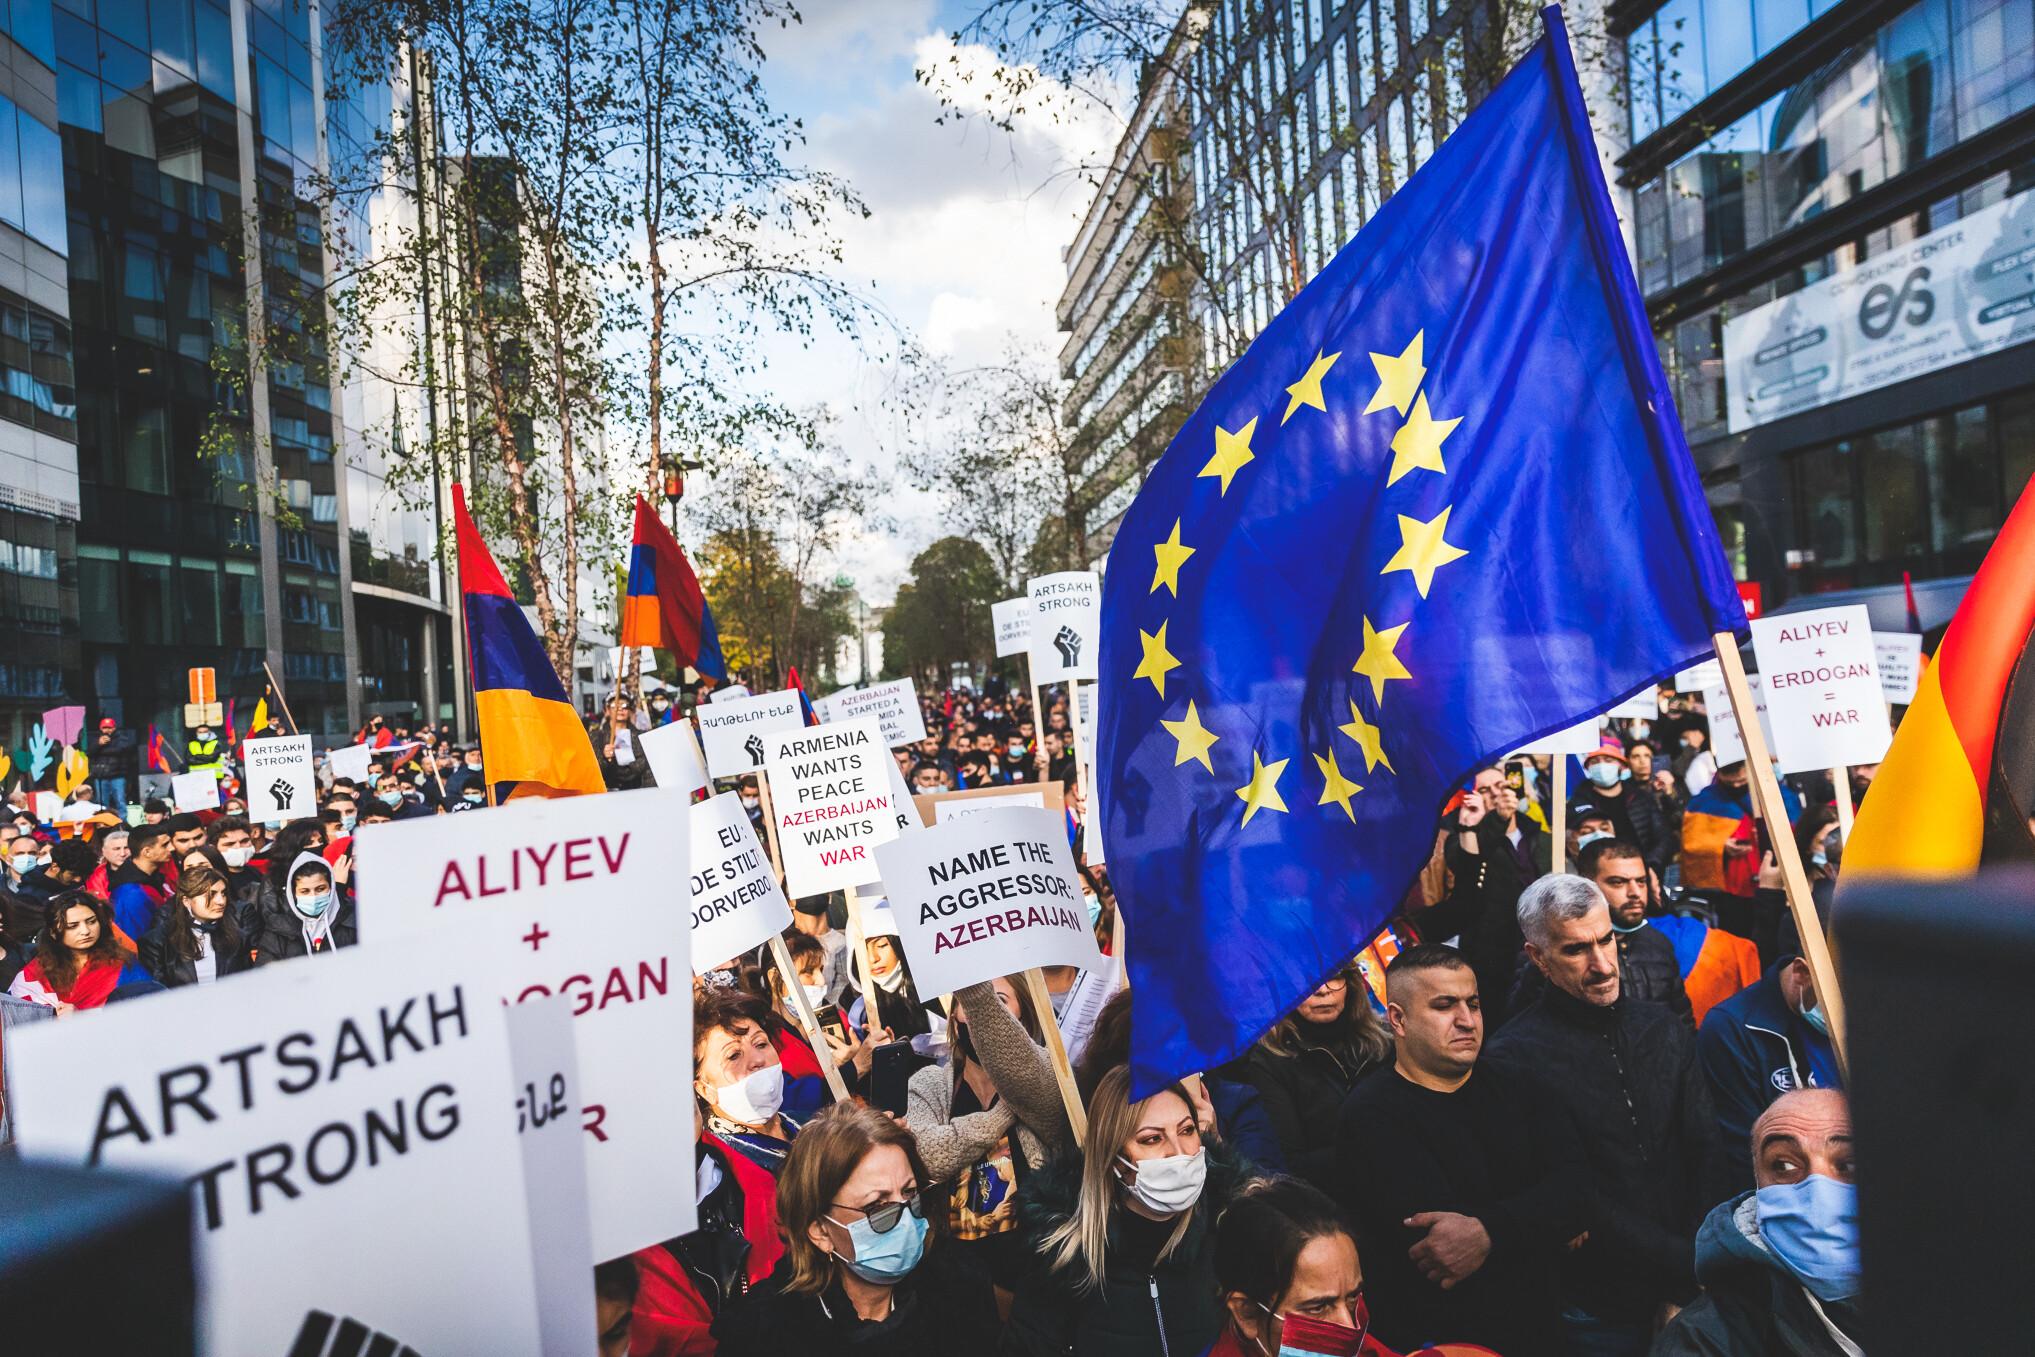 20201001-Manifestation-Armenia-Schuman-058